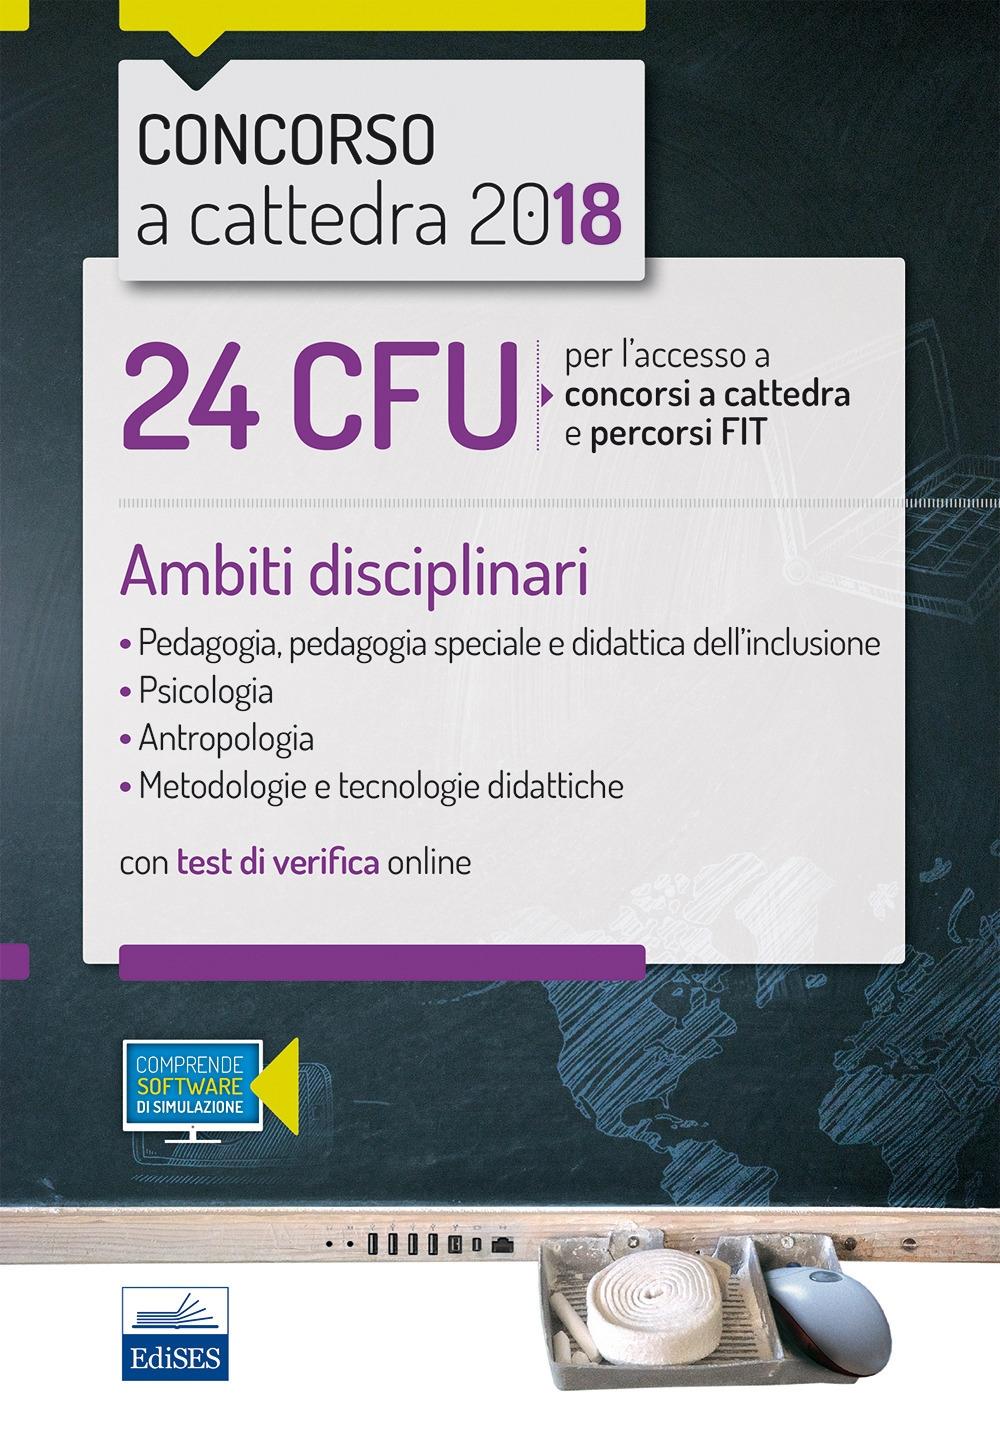 24 CFU concorsi a cattedra e percorsi FIT